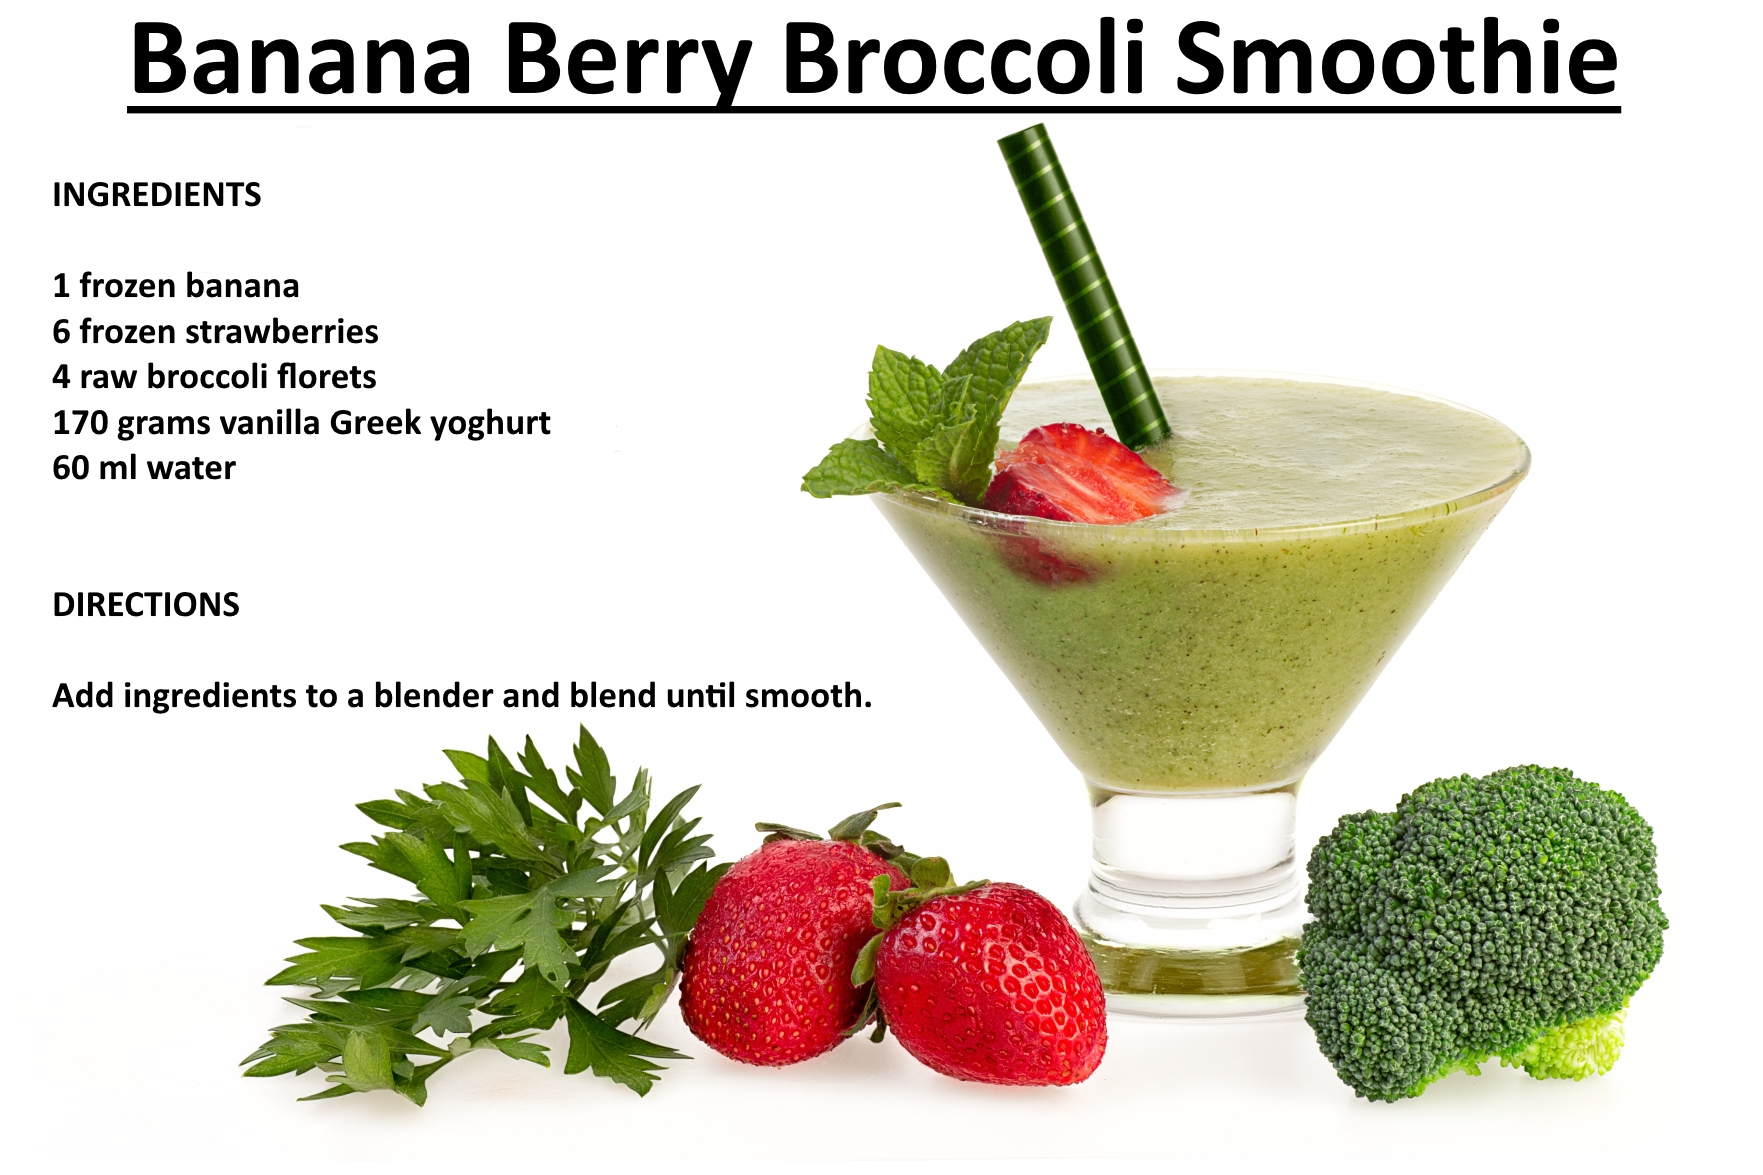 Banana Berry Broccoli Smoothie